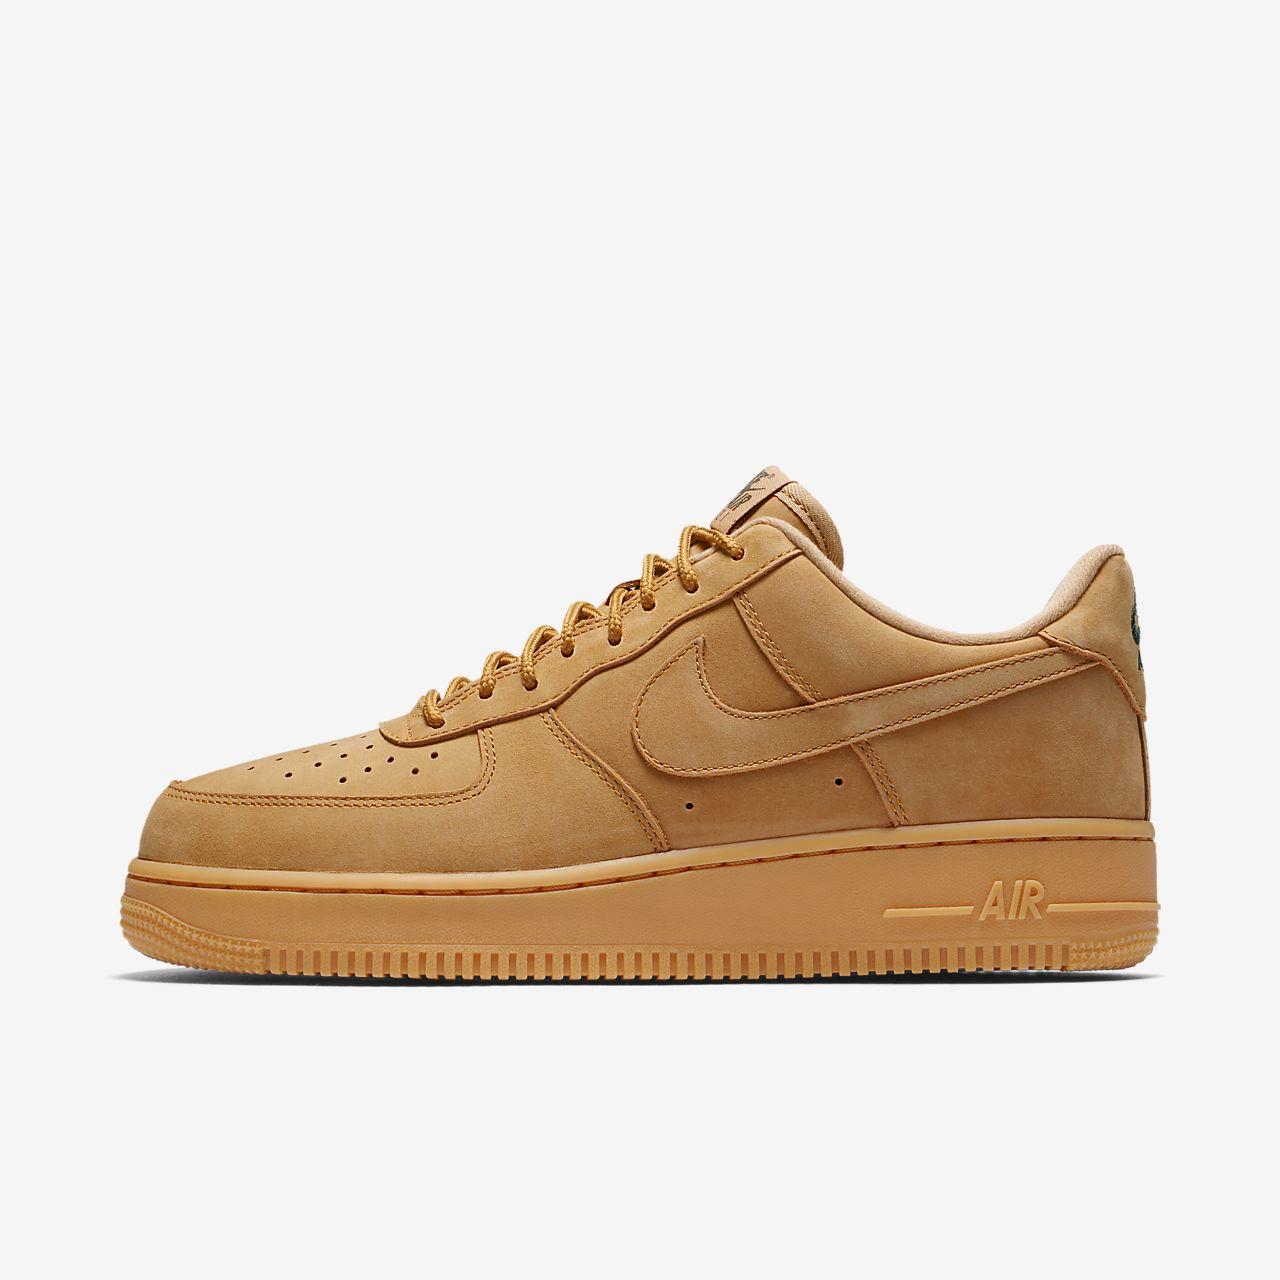 on sale 0c348 aa446 ... Nike Air Force 1 07 WB – sko til mænd